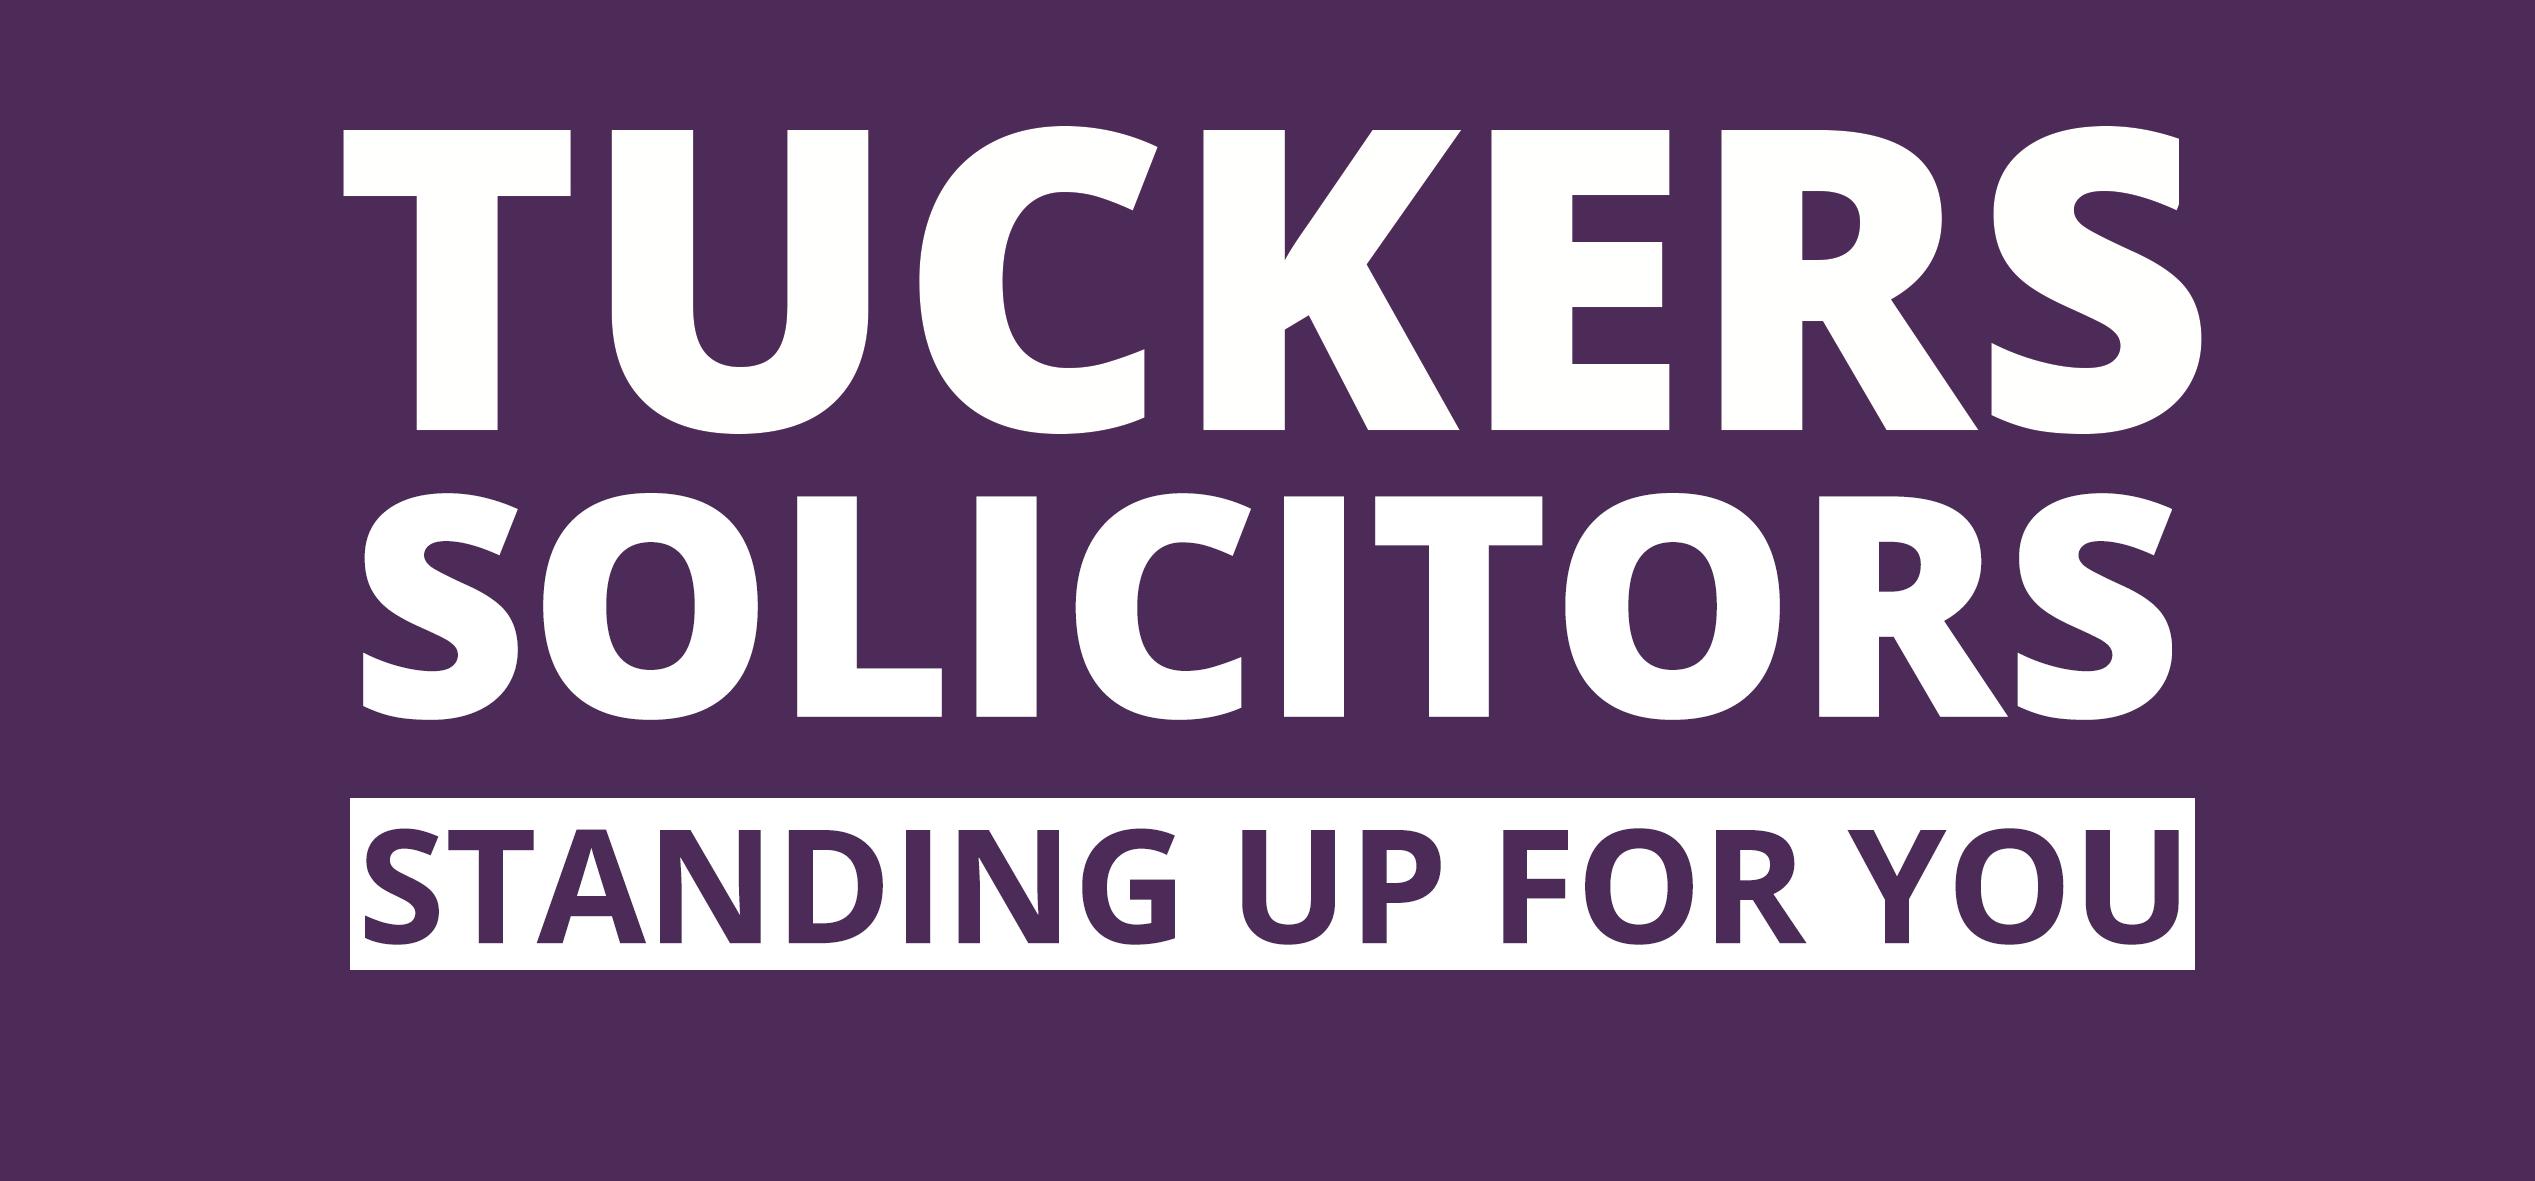 Tuckers Solicitors